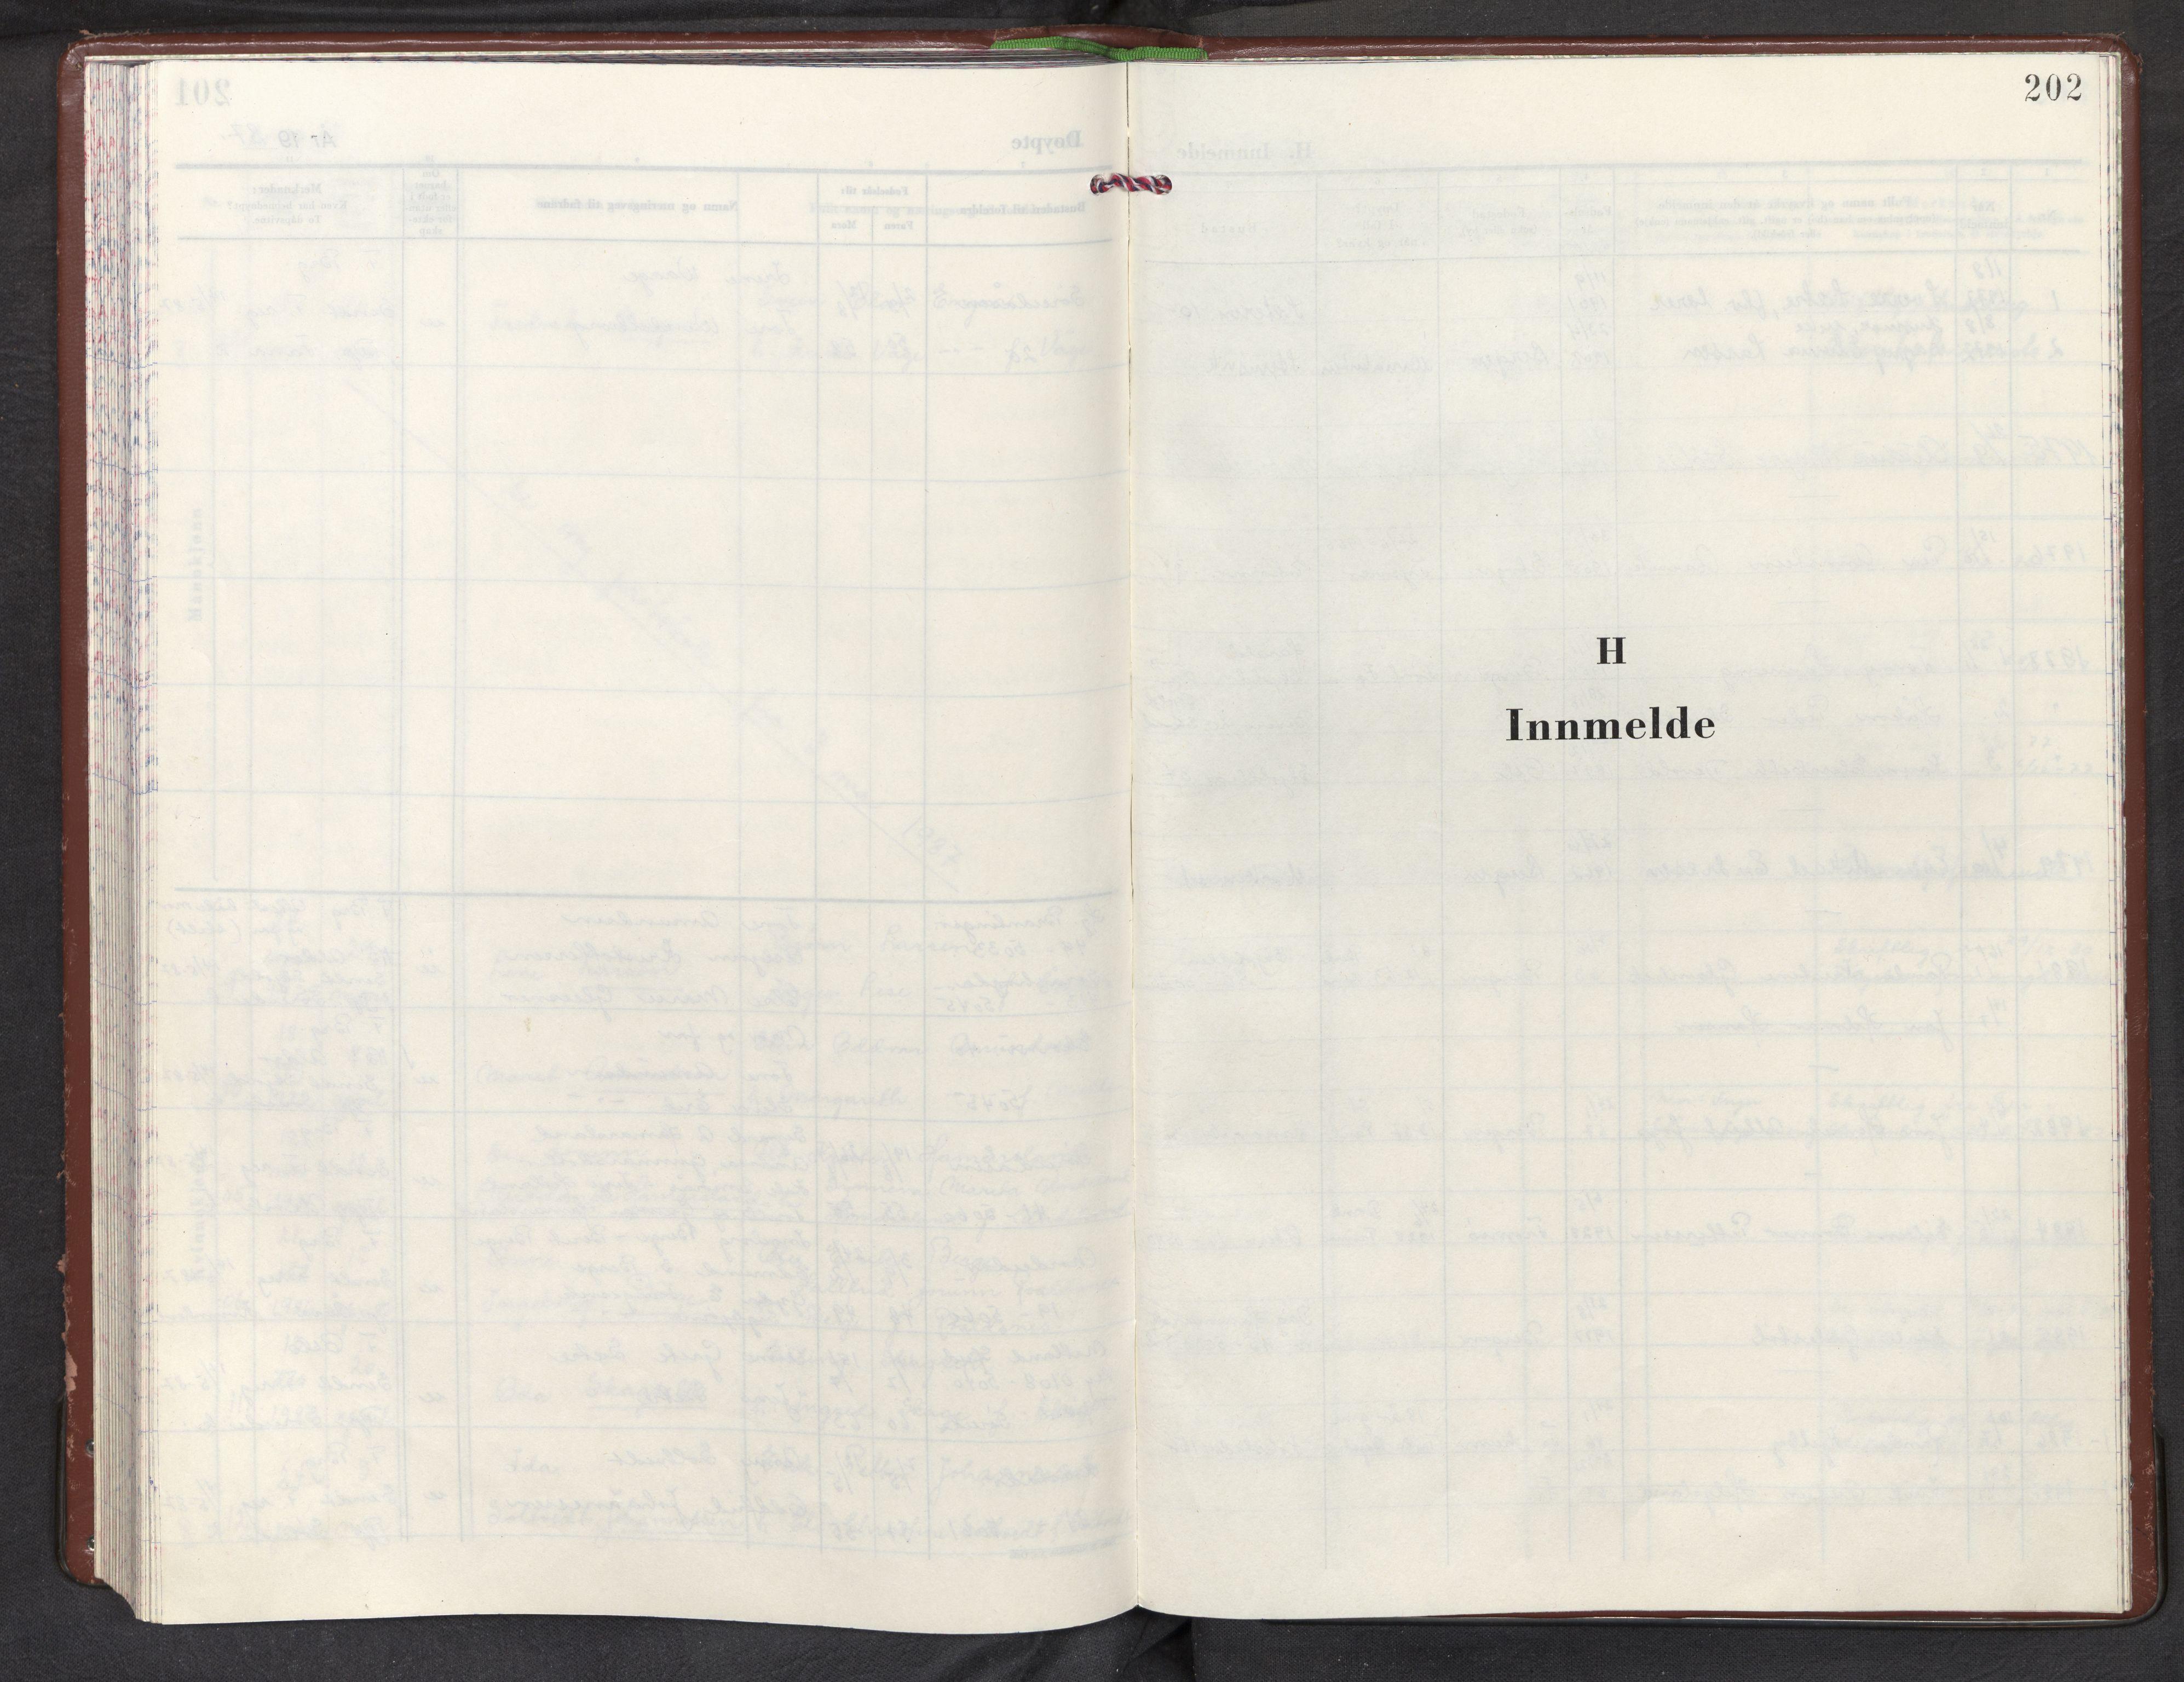 SAB, Nordås sokneprestembete, Parish register (official) no. A 1, 1971-1987, p. 202